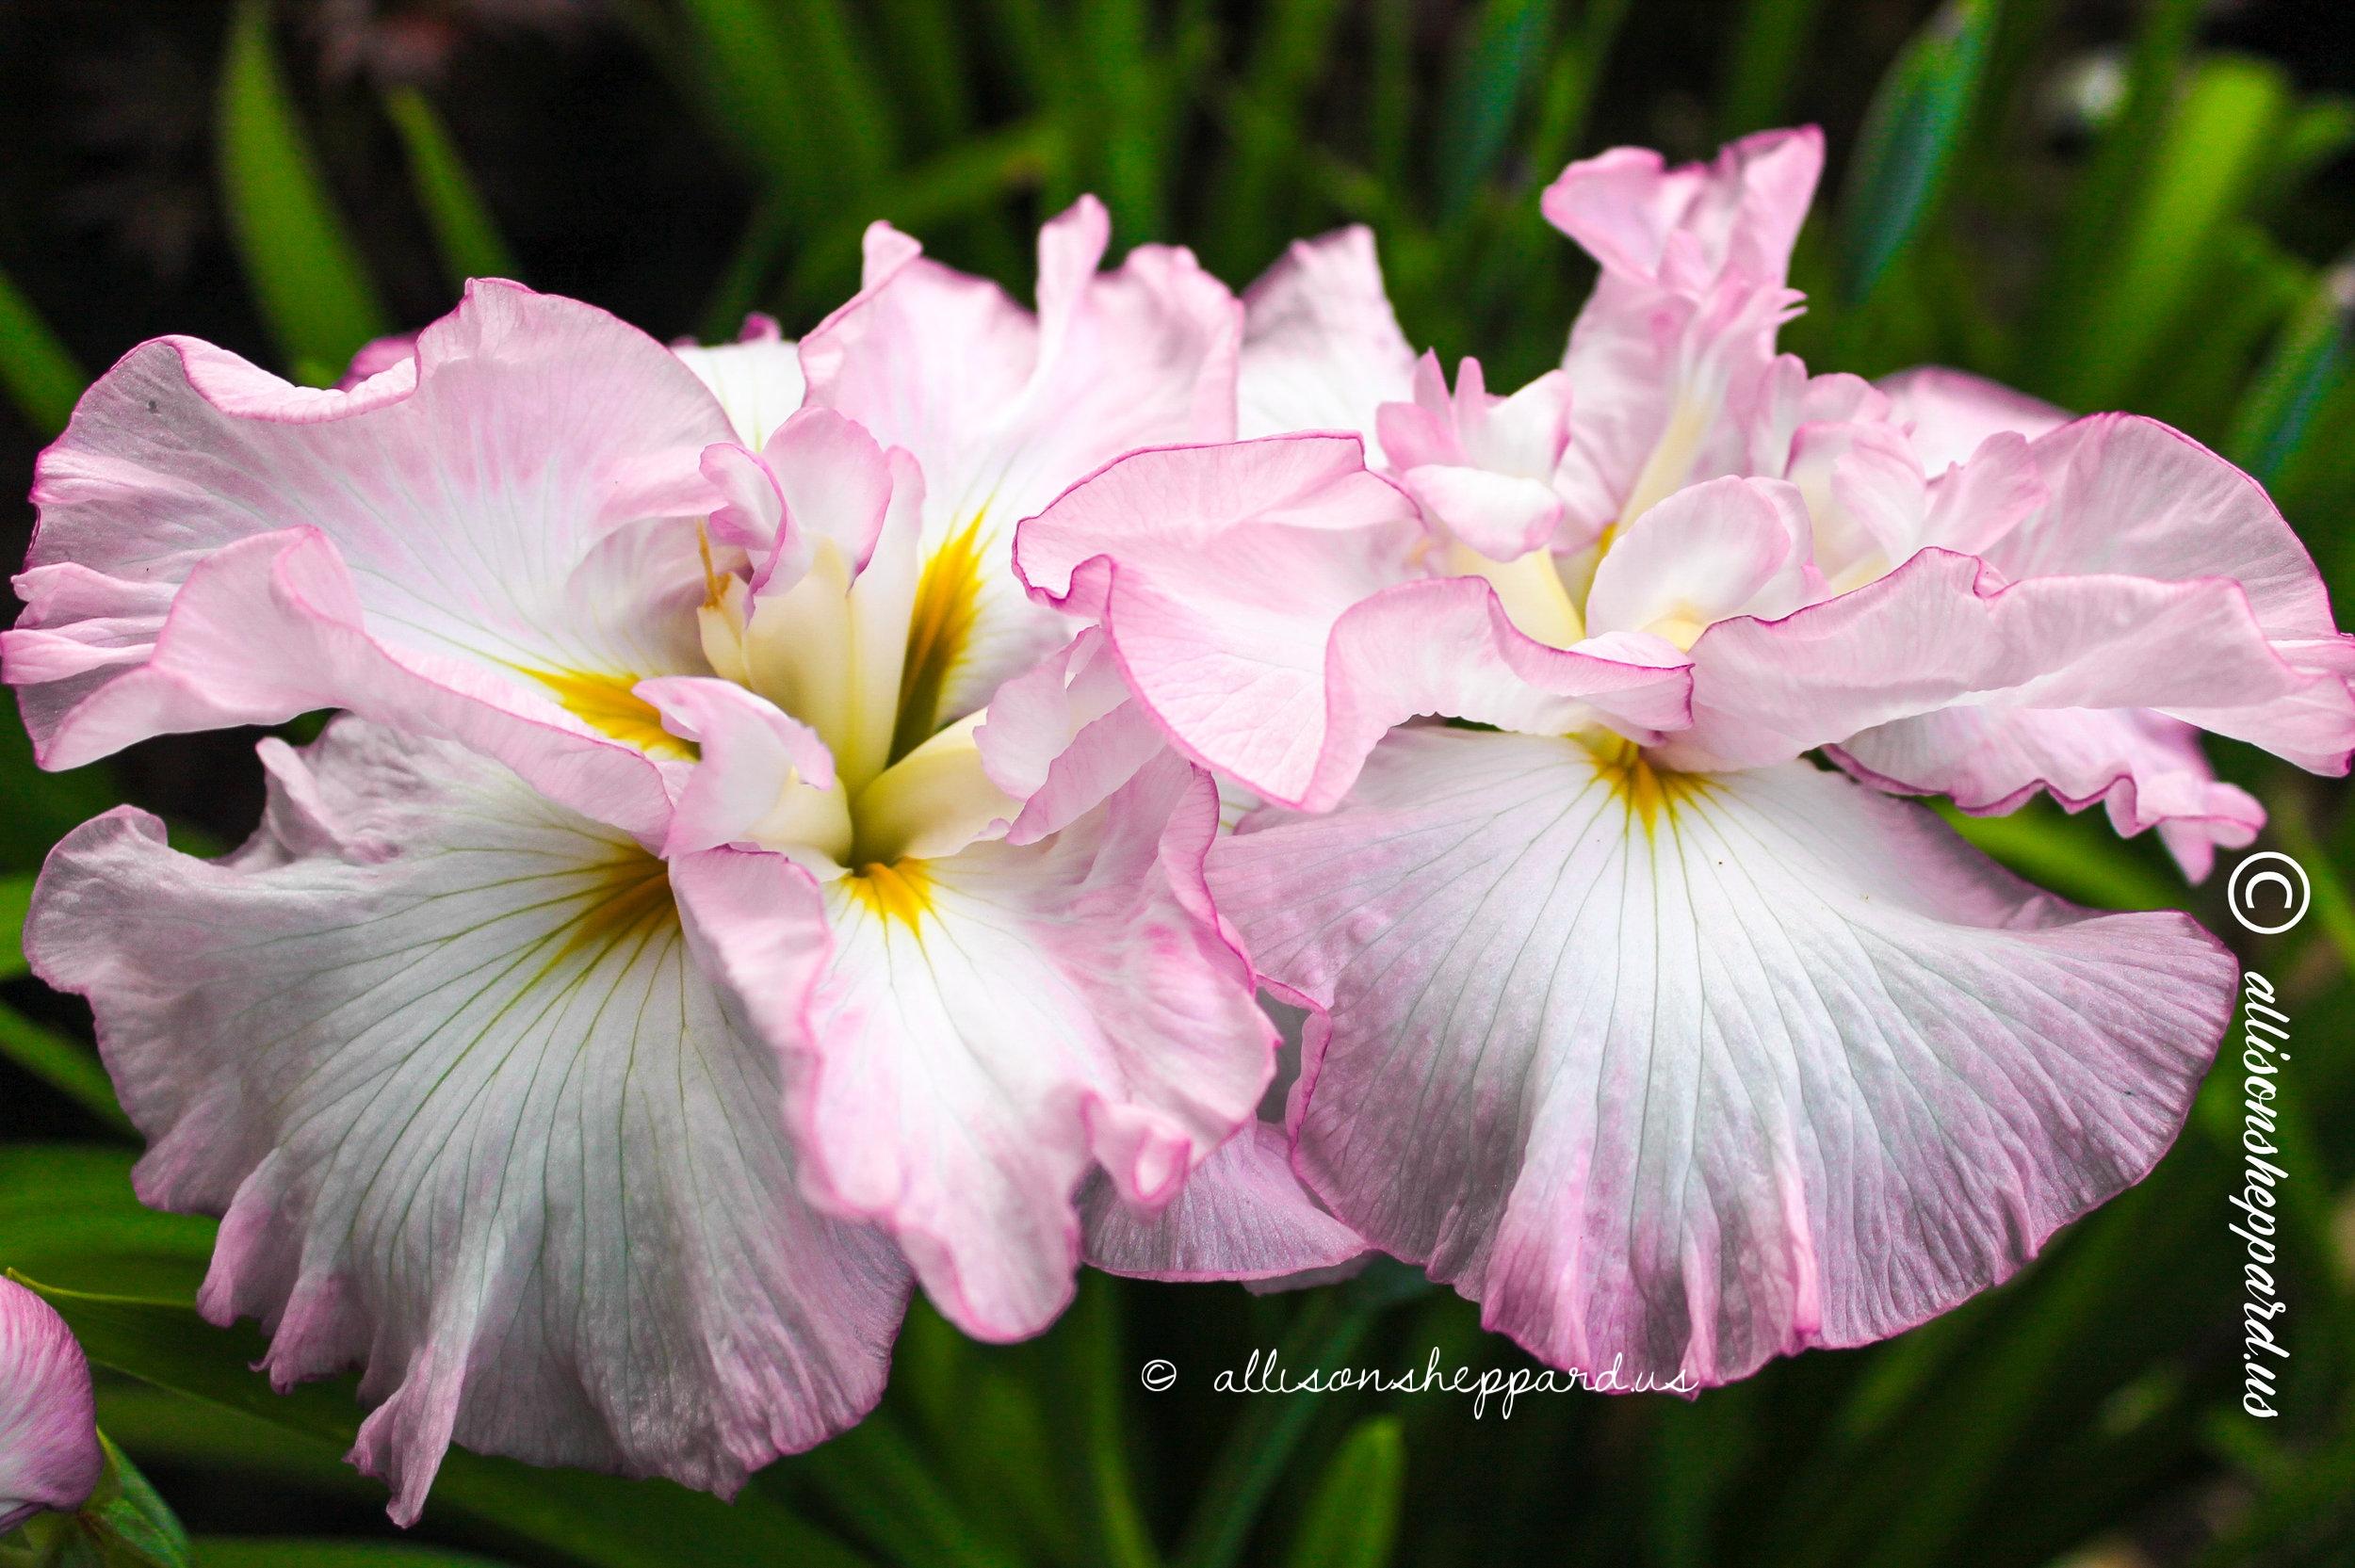 flora-fauna-2.jpg